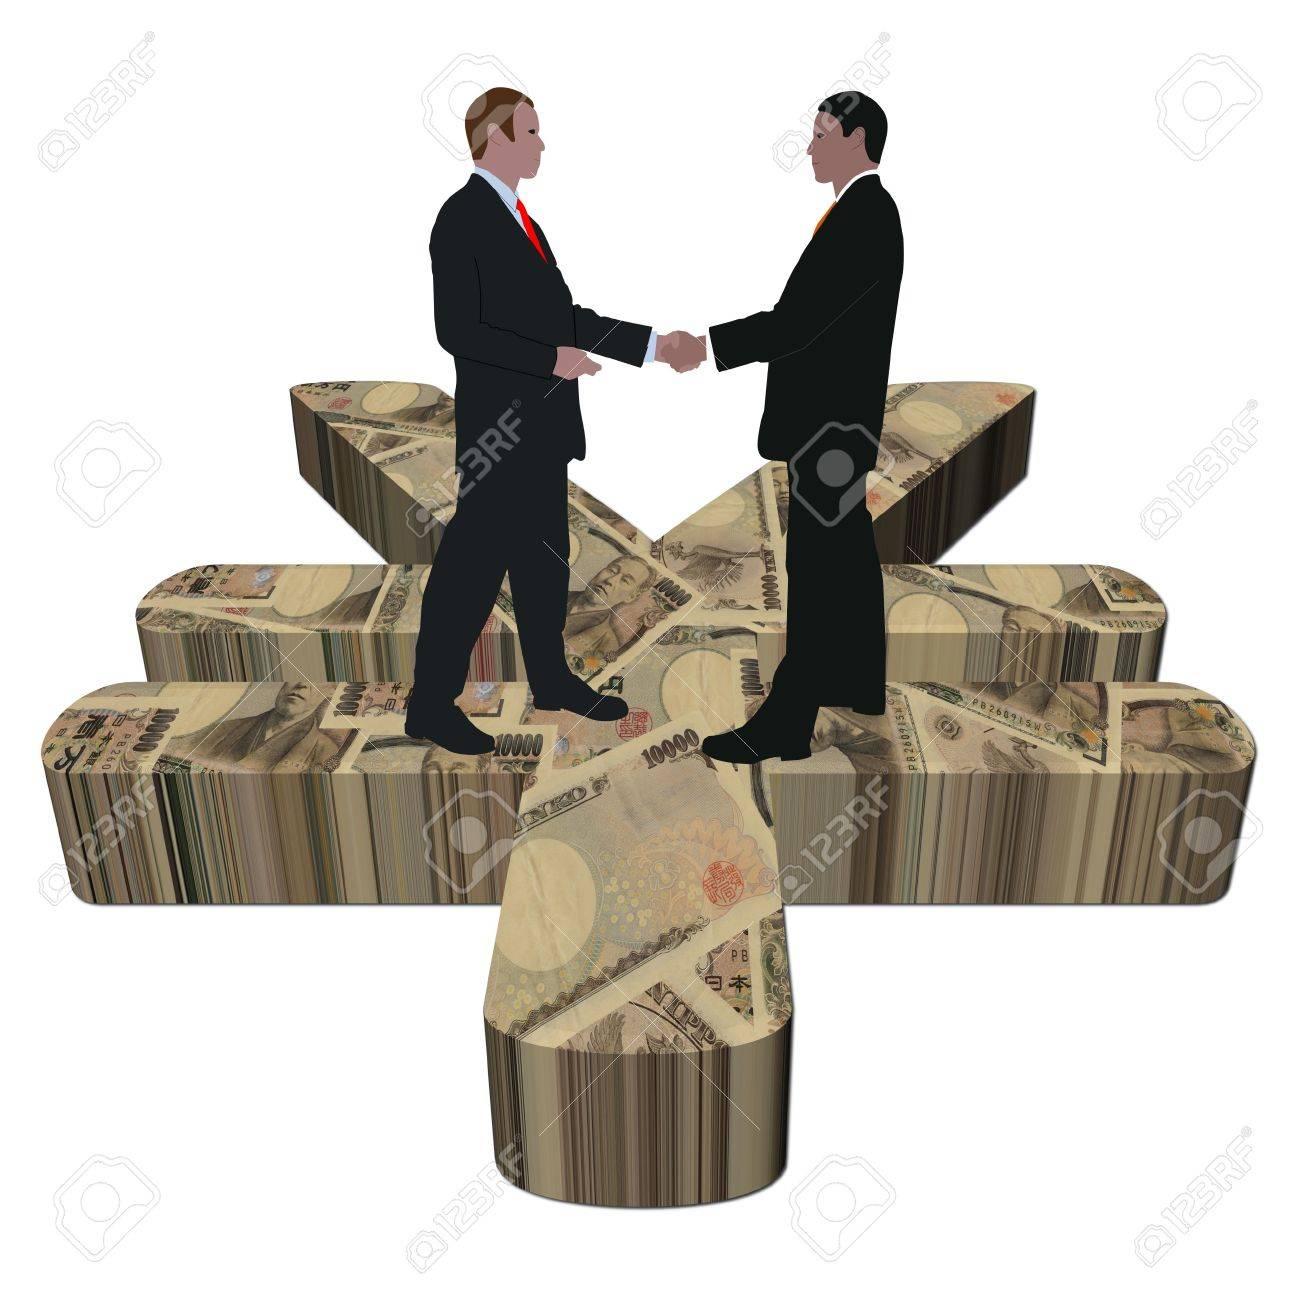 Business men meeting on giant japanese yen symbol illustration business men meeting on giant japanese yen symbol illustration stock illustration 6363202 biocorpaavc Choice Image